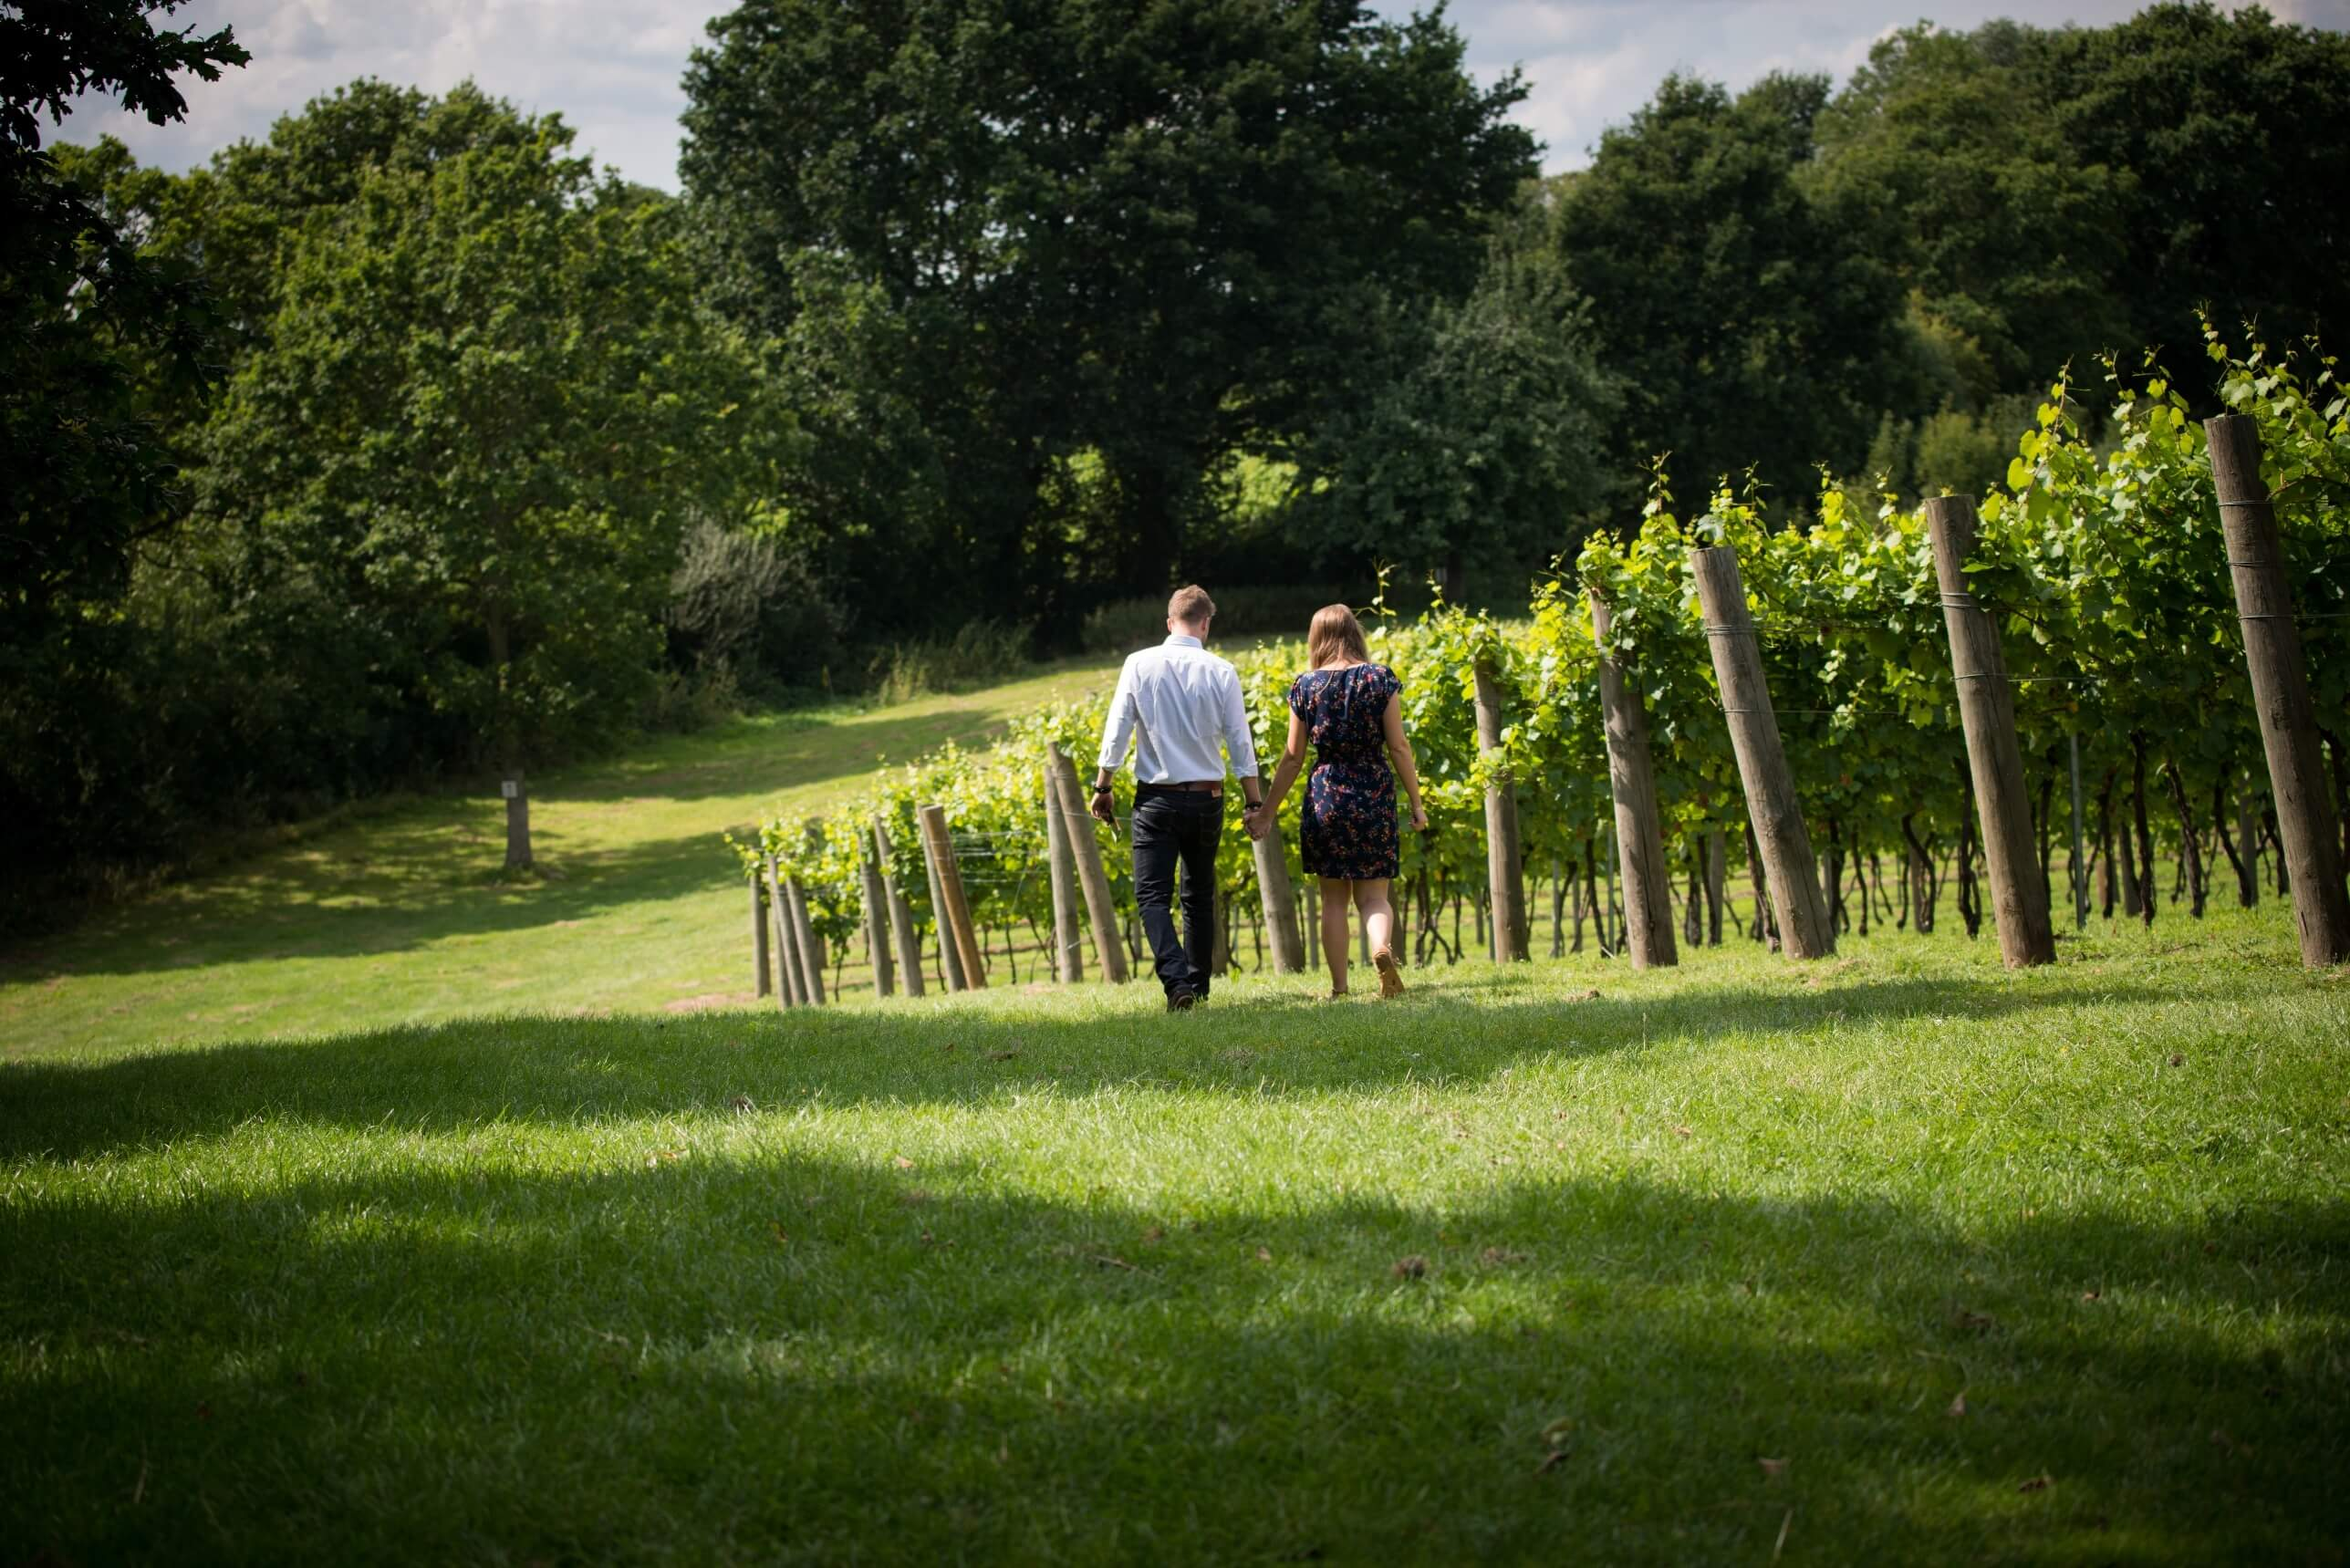 Walking hand in hand through a vineyard